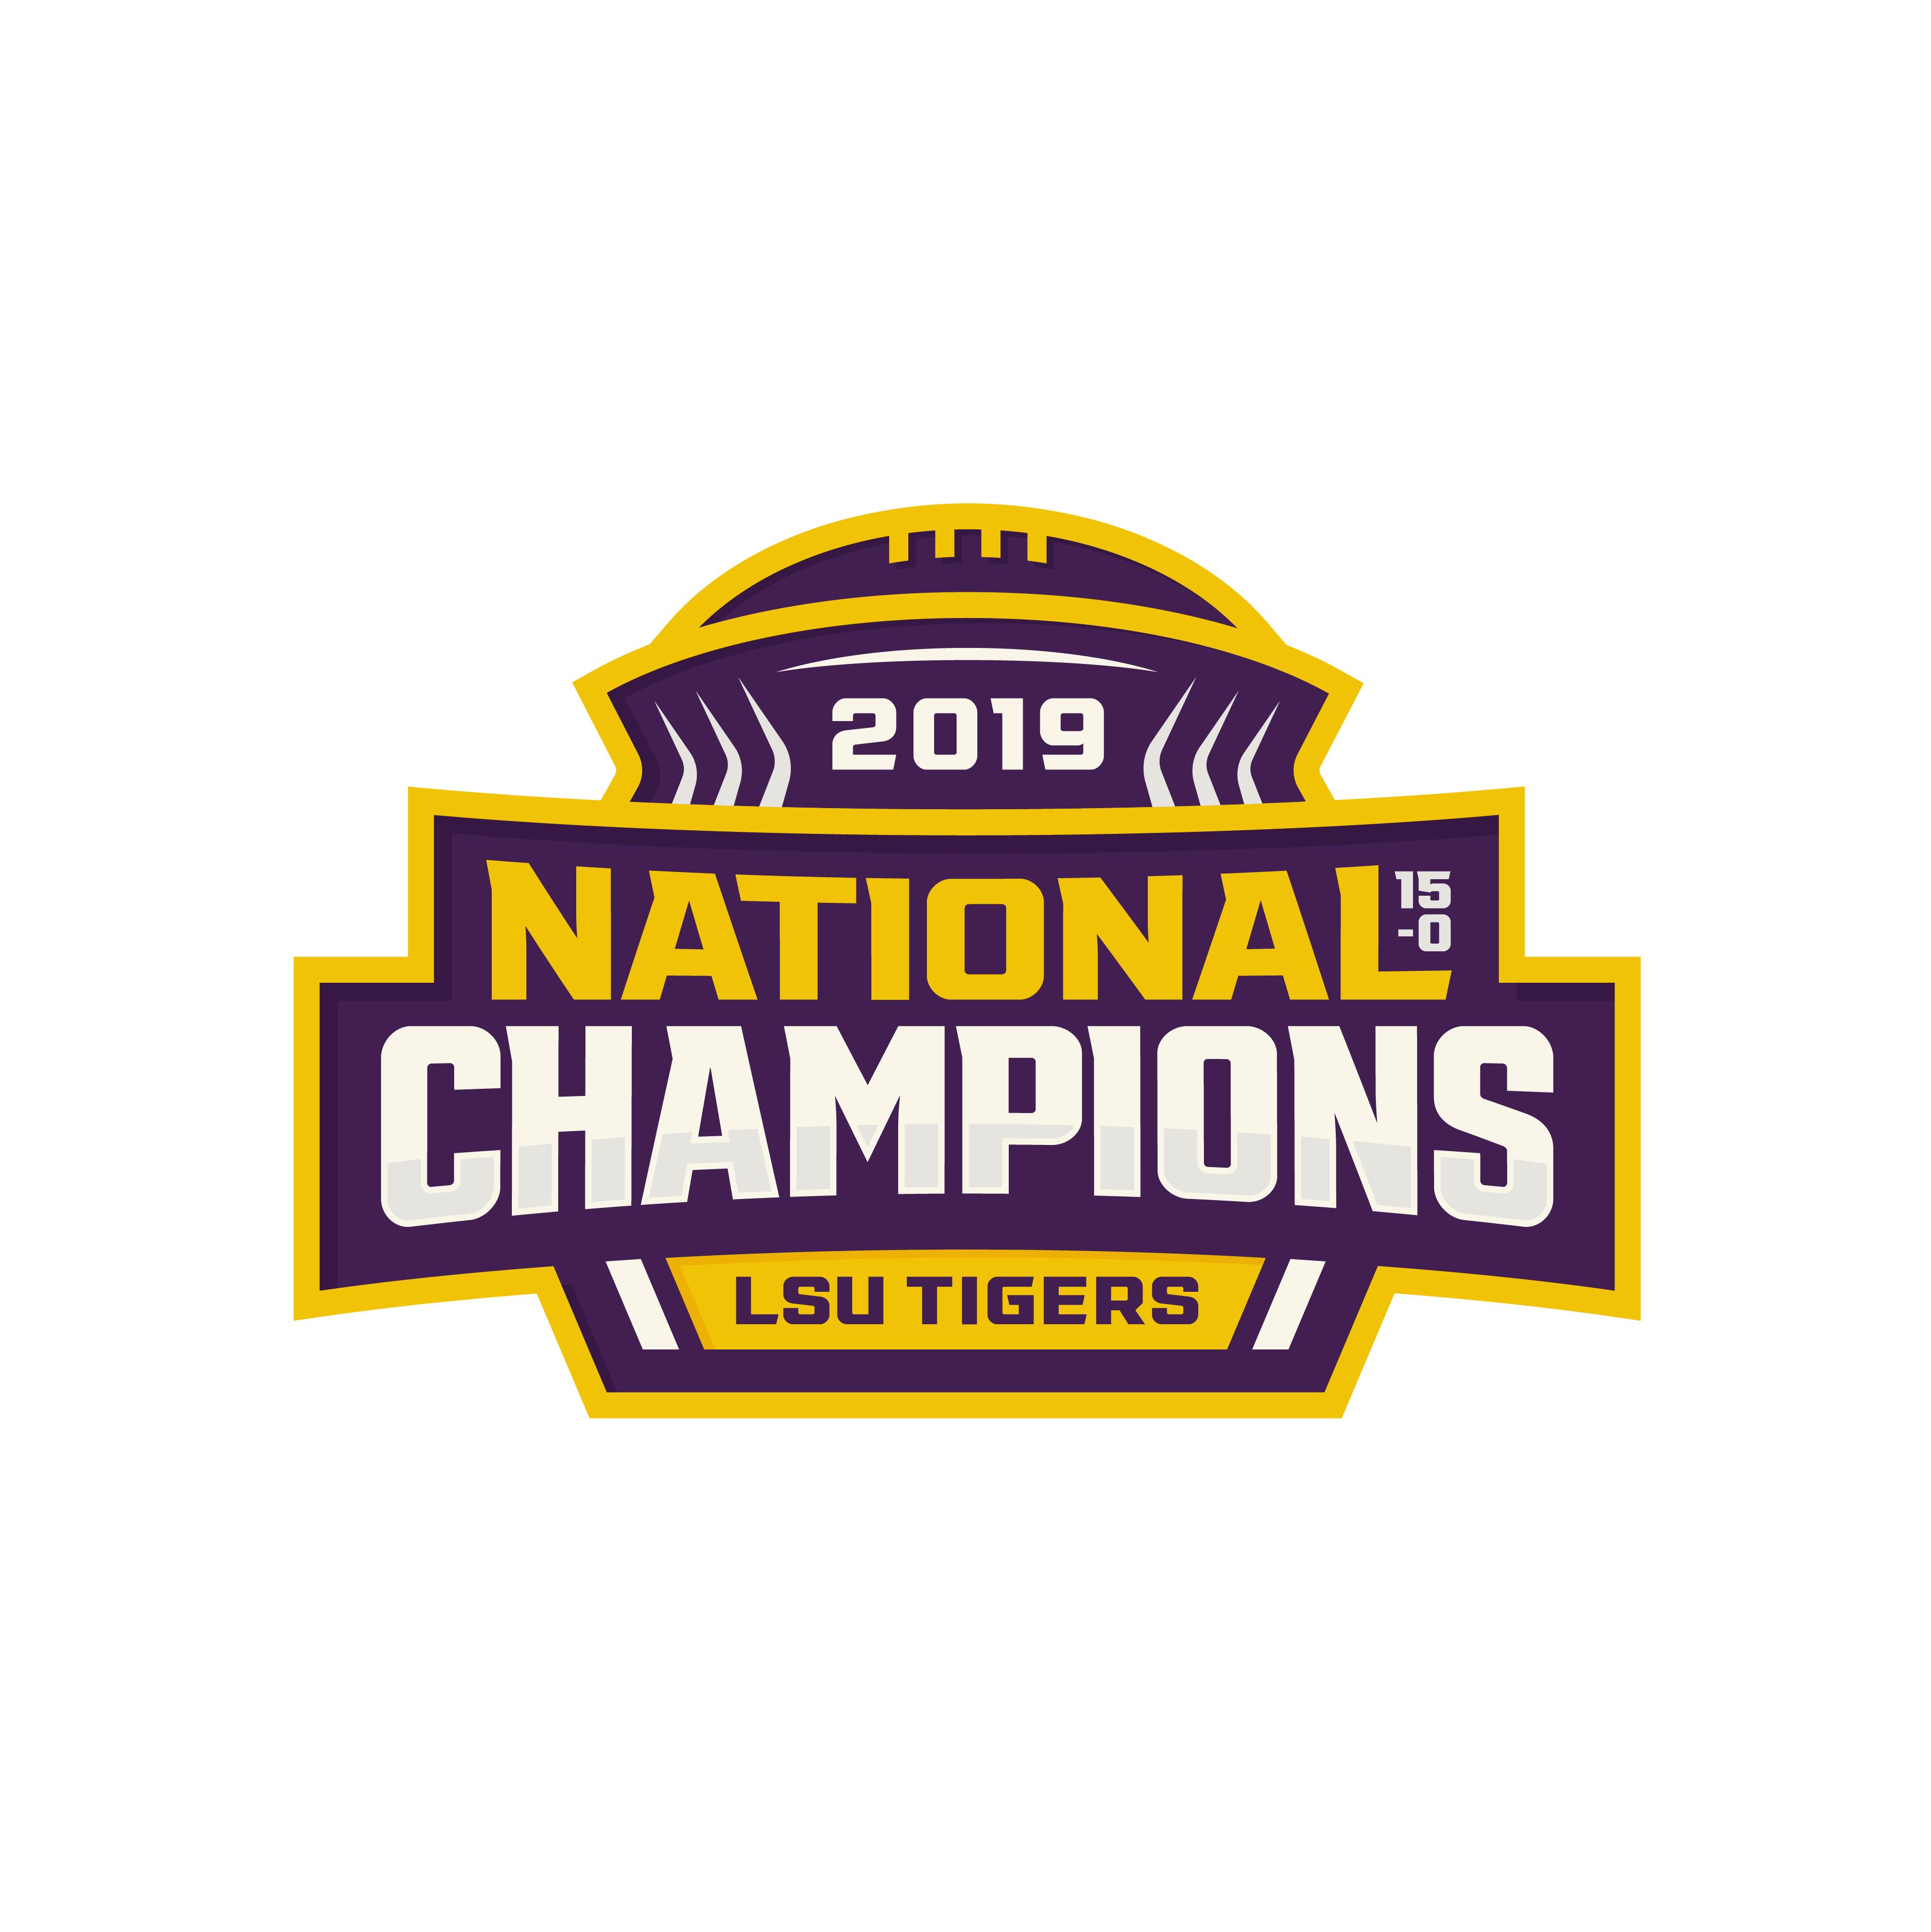 2019 National Champions Logo